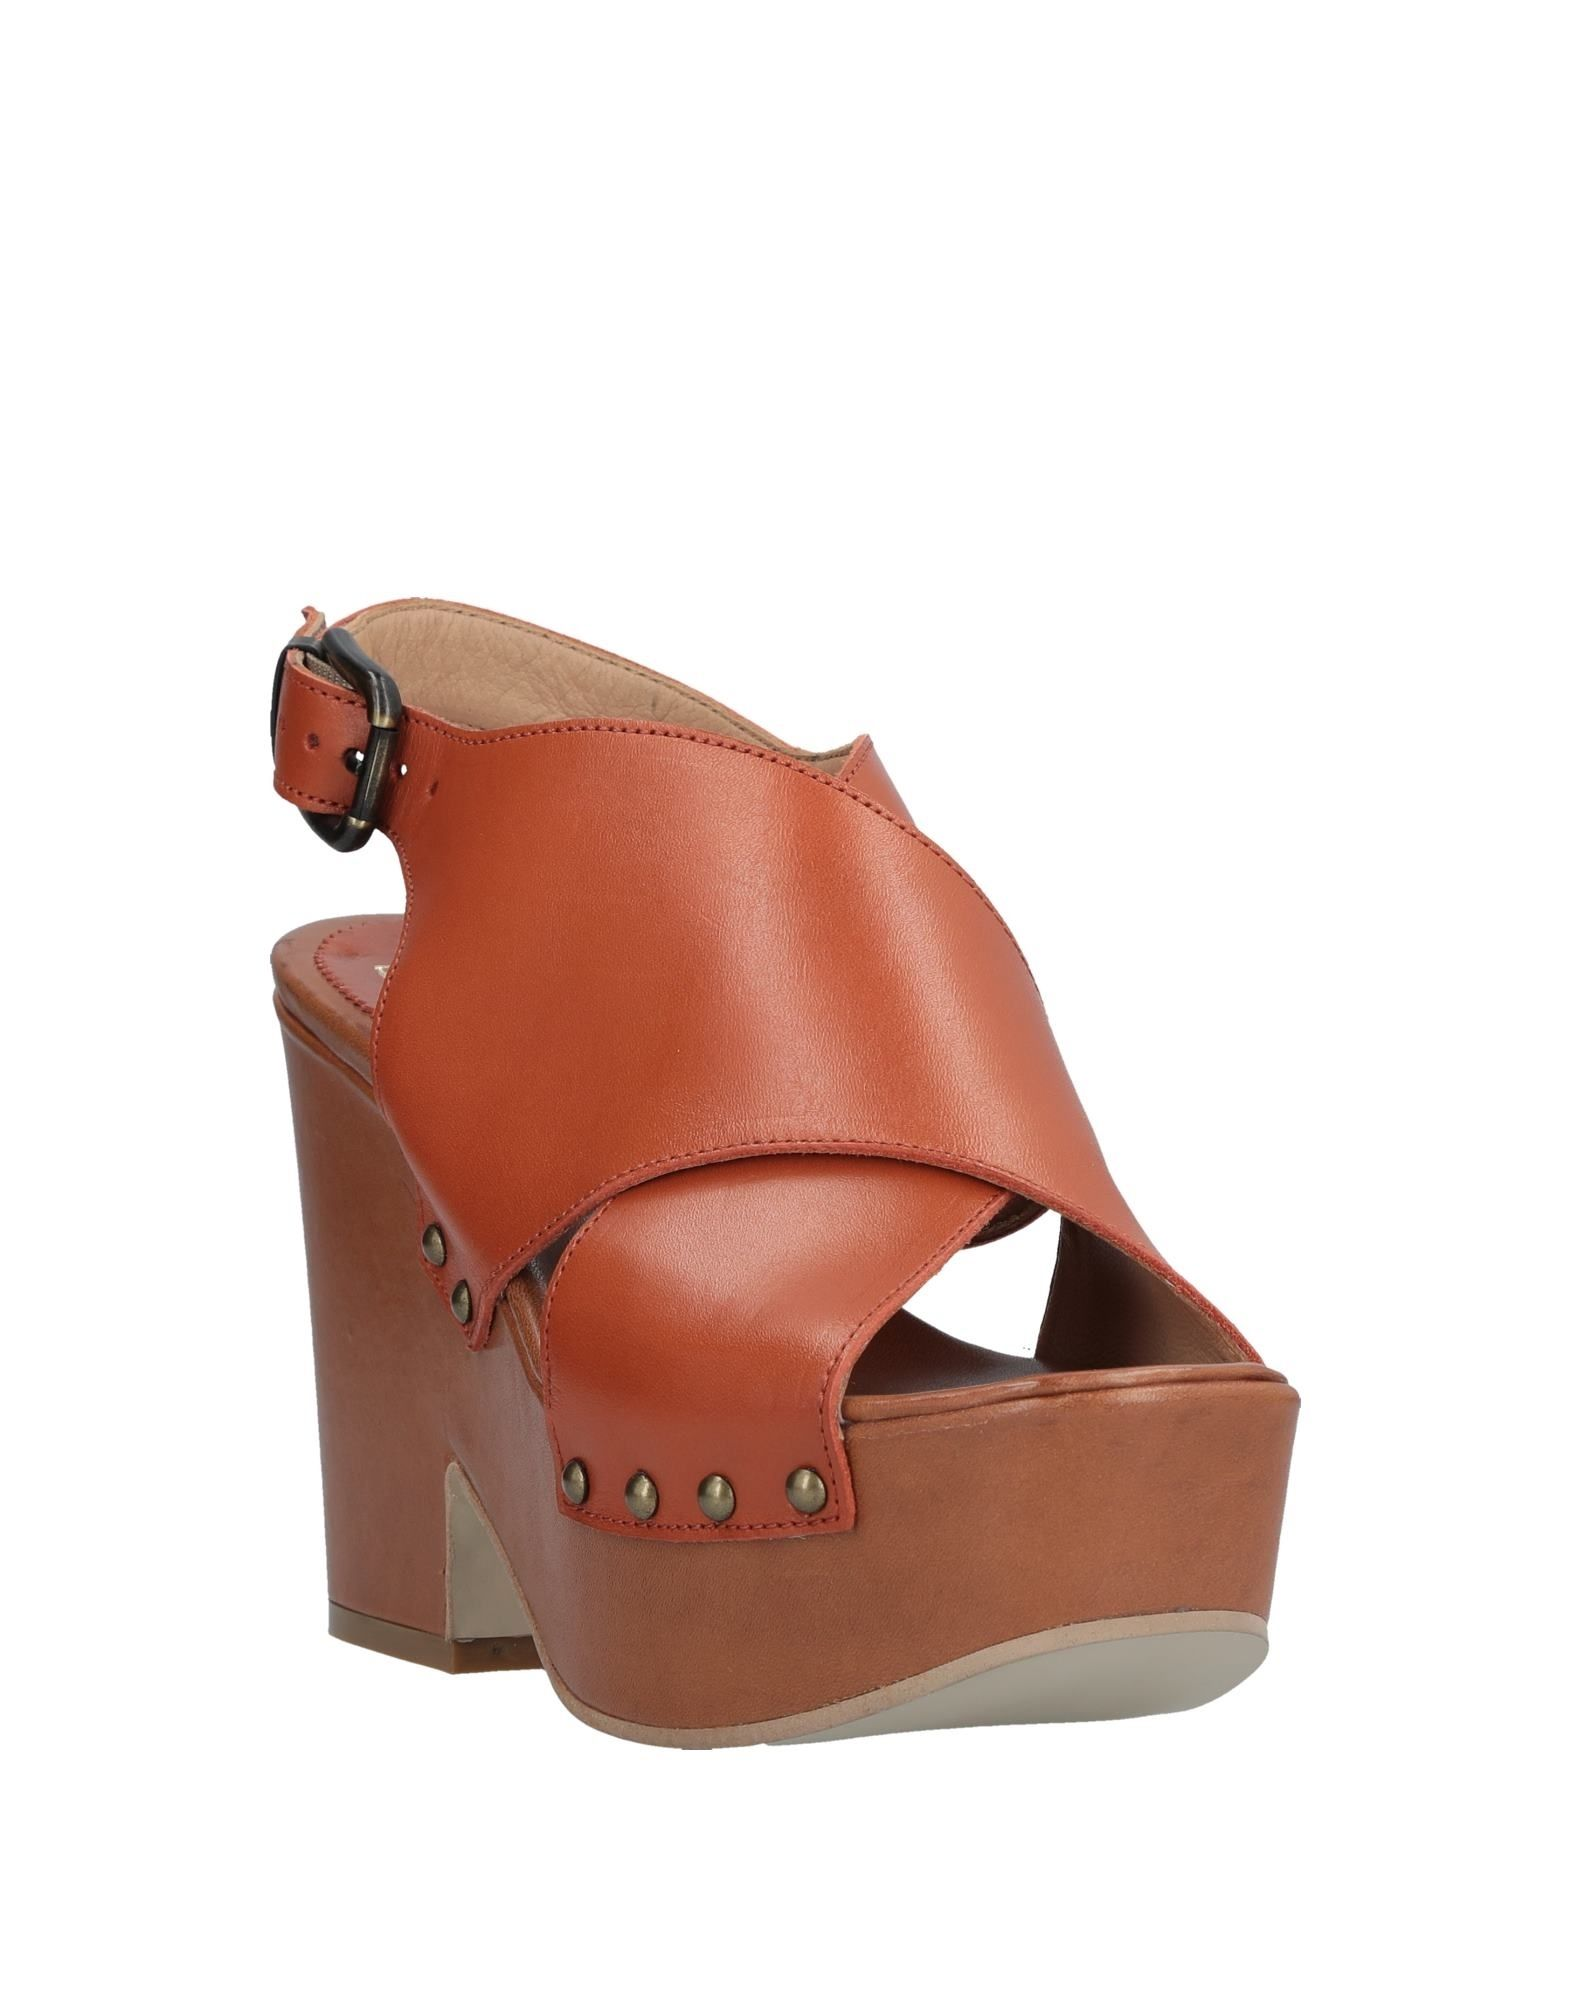 Fru.It Sandals - Women Fru.It Sandals online on    United Kingdom - 11532580RD 96489b